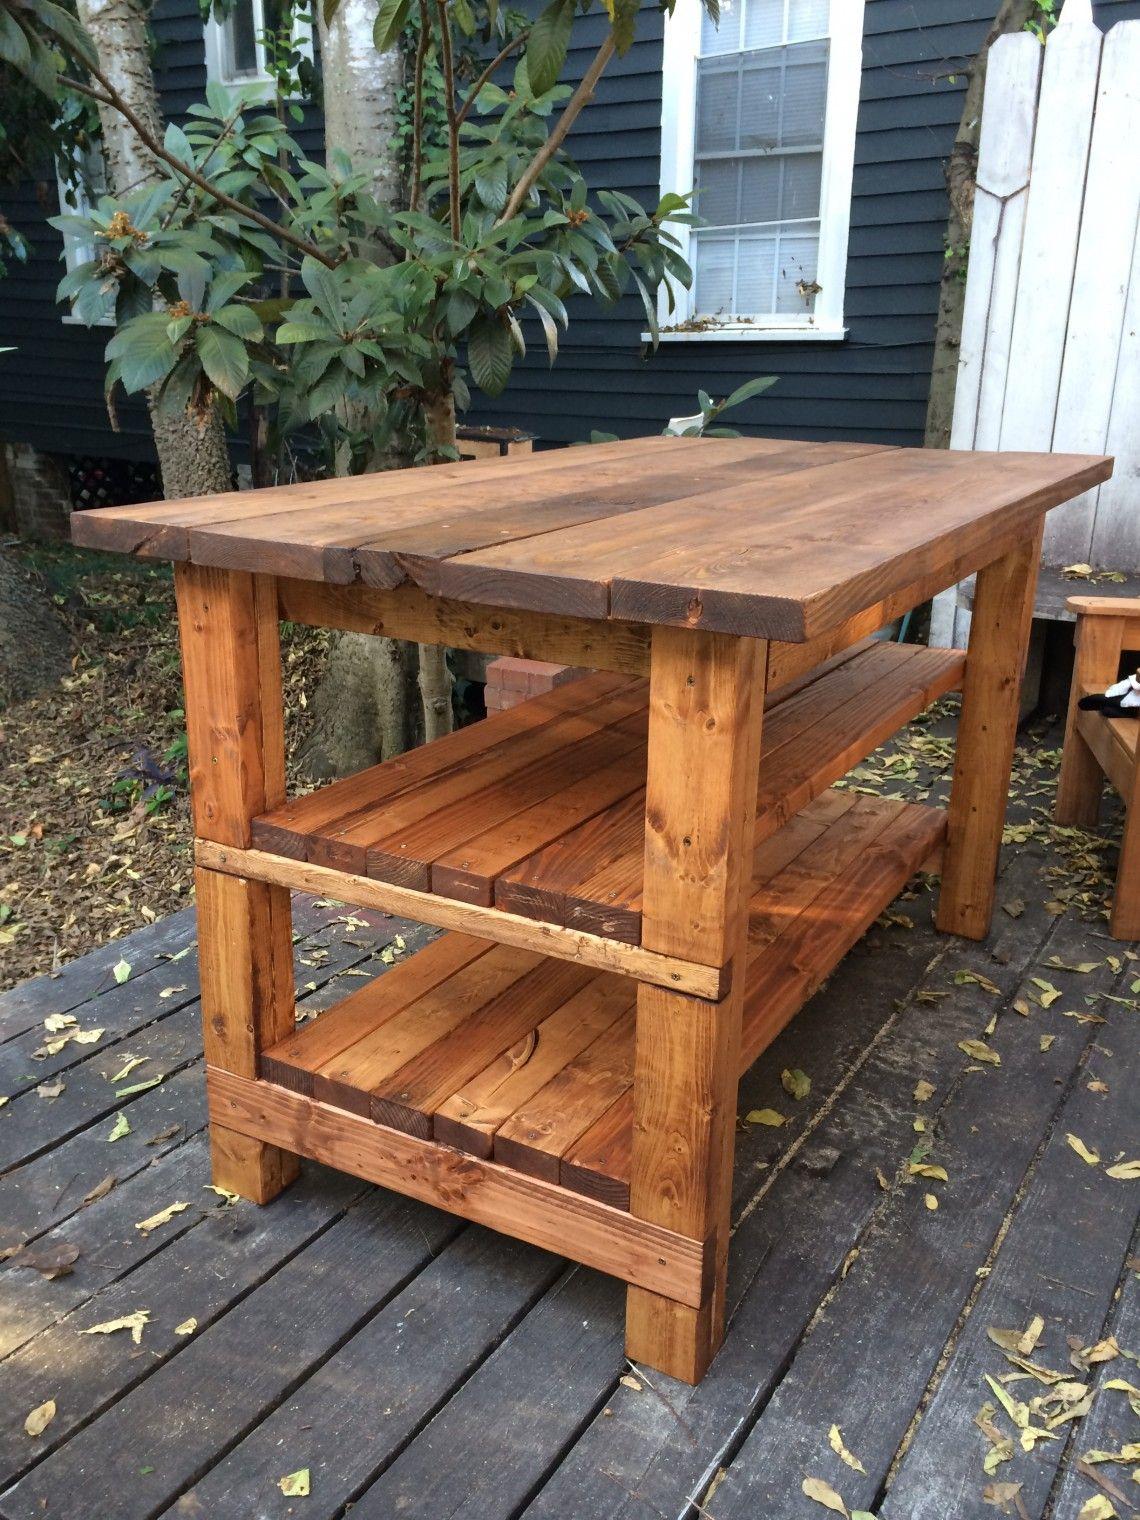 furniture ideas simple carpenter made rectangular open shelving butcher block rustic kitchen on outdoor kitchen island id=48265